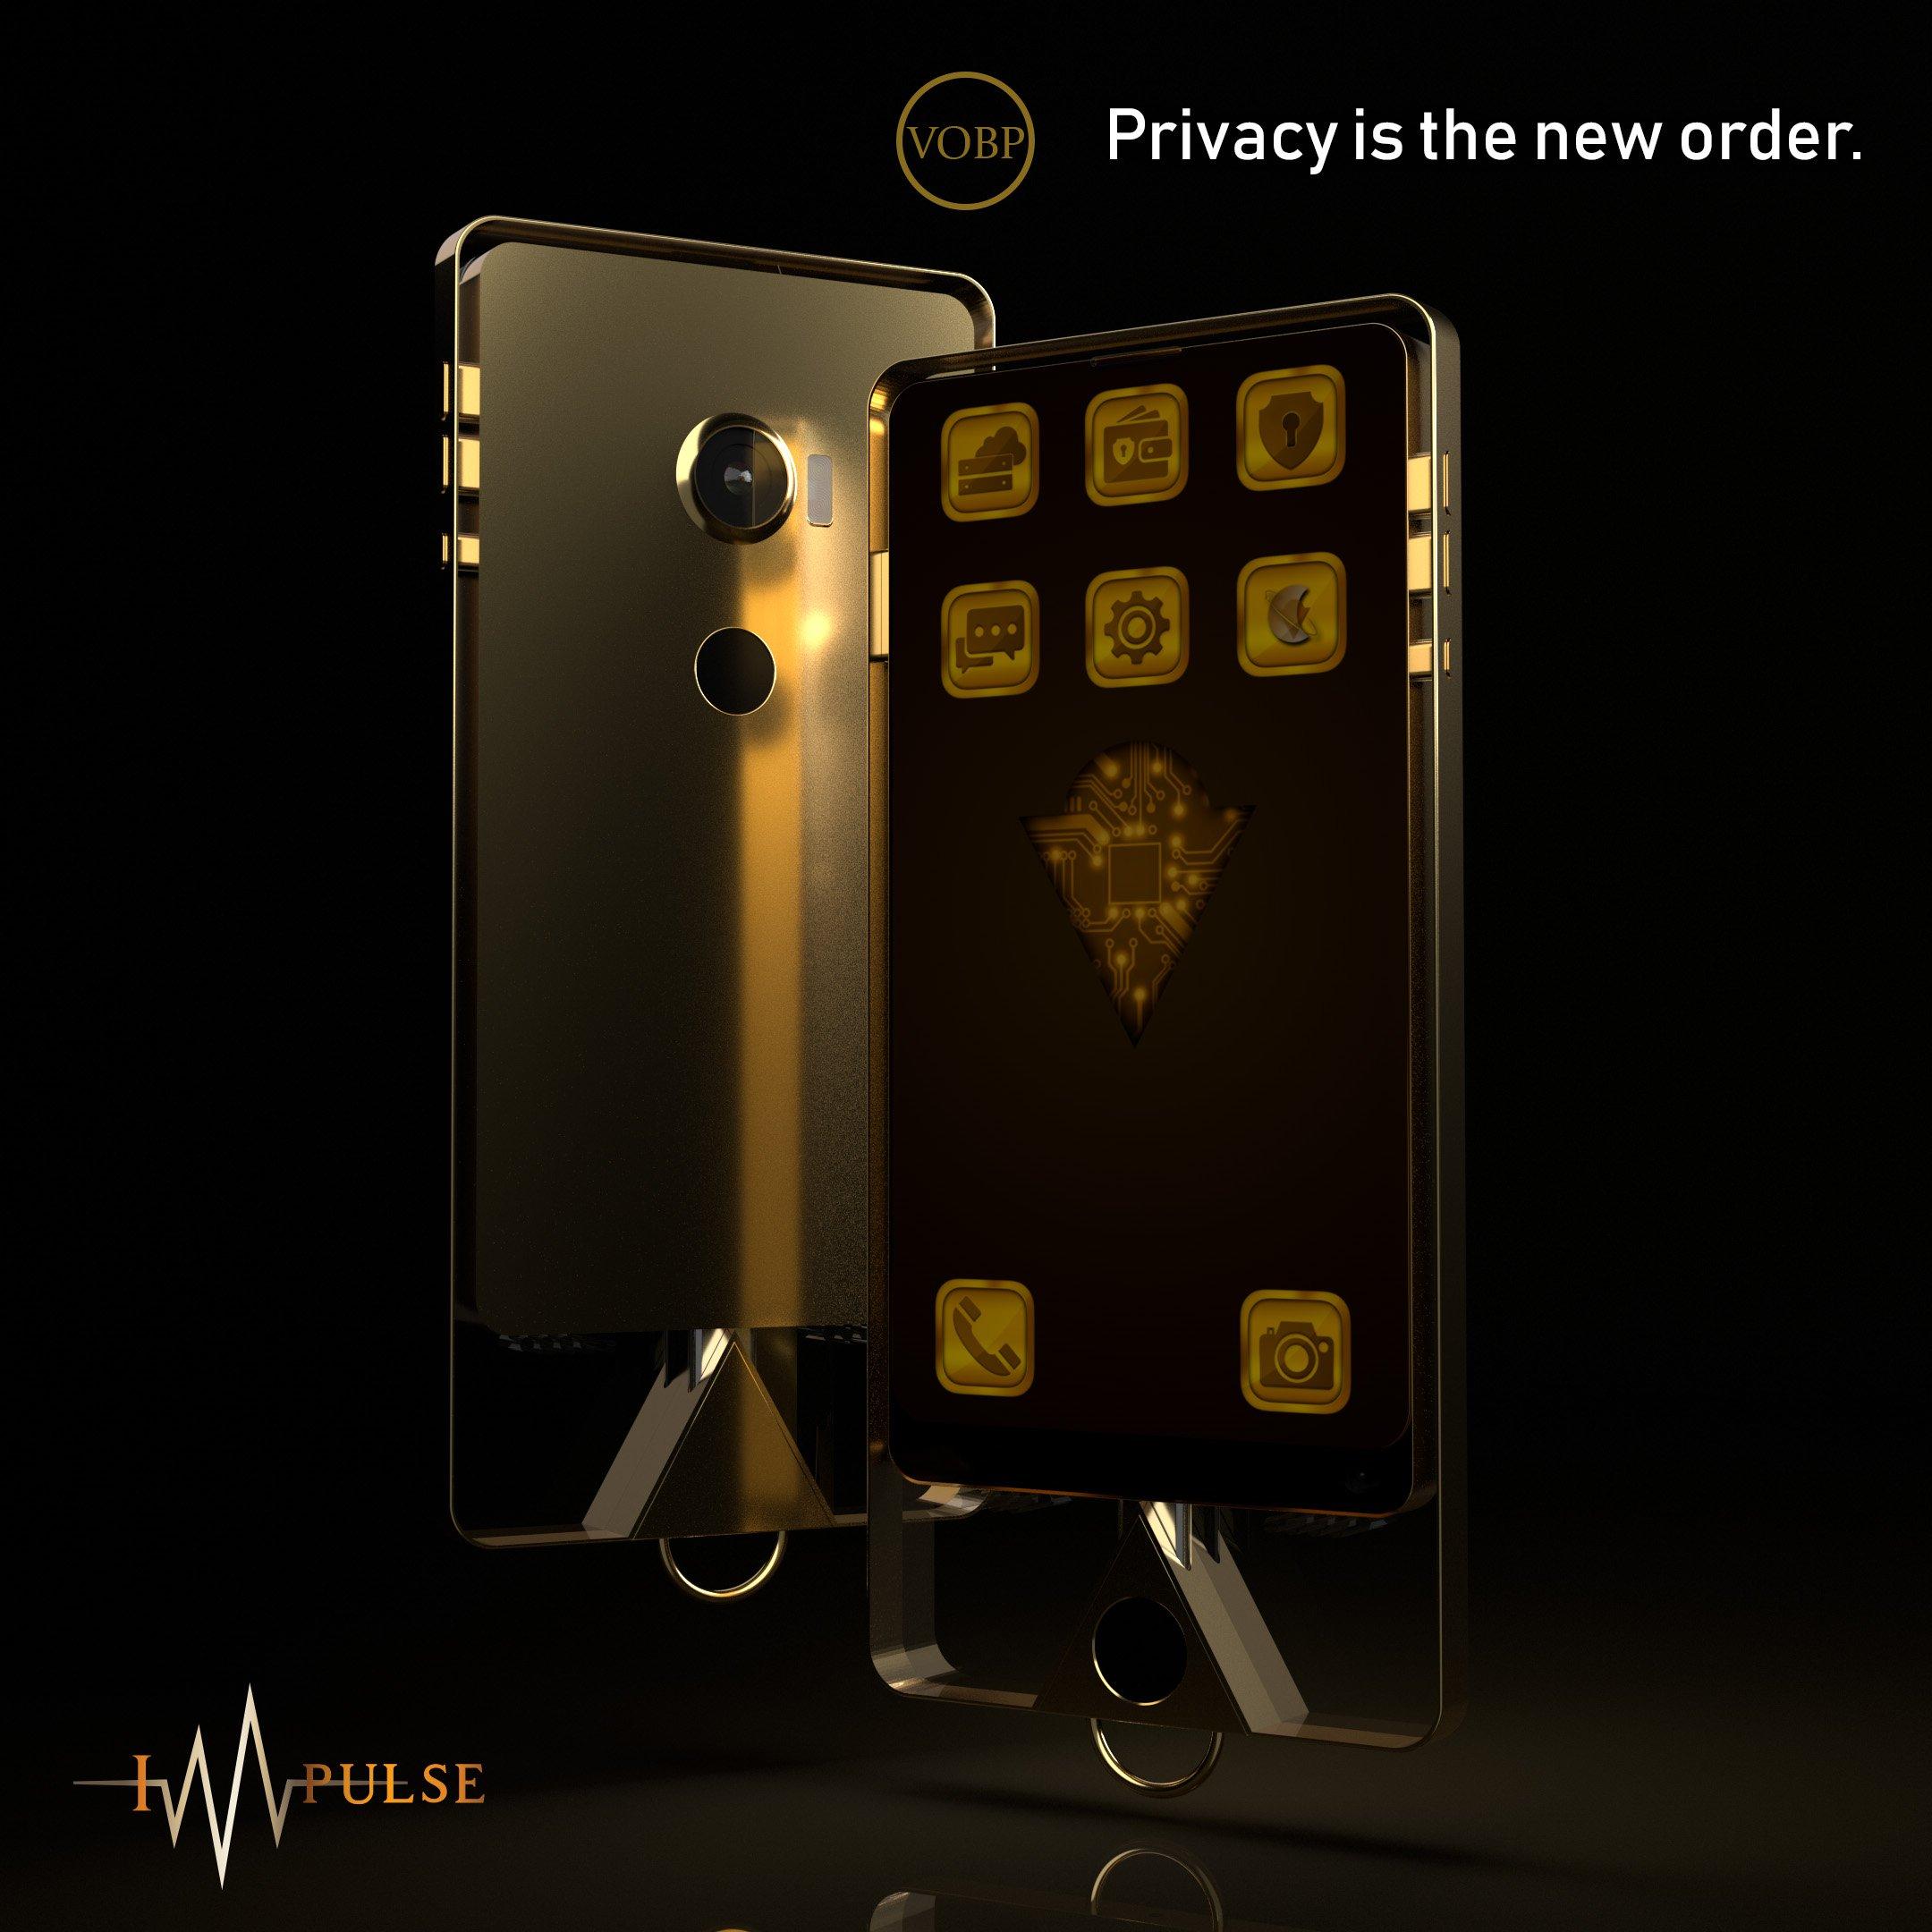 IMpulse K1 Phone - 3